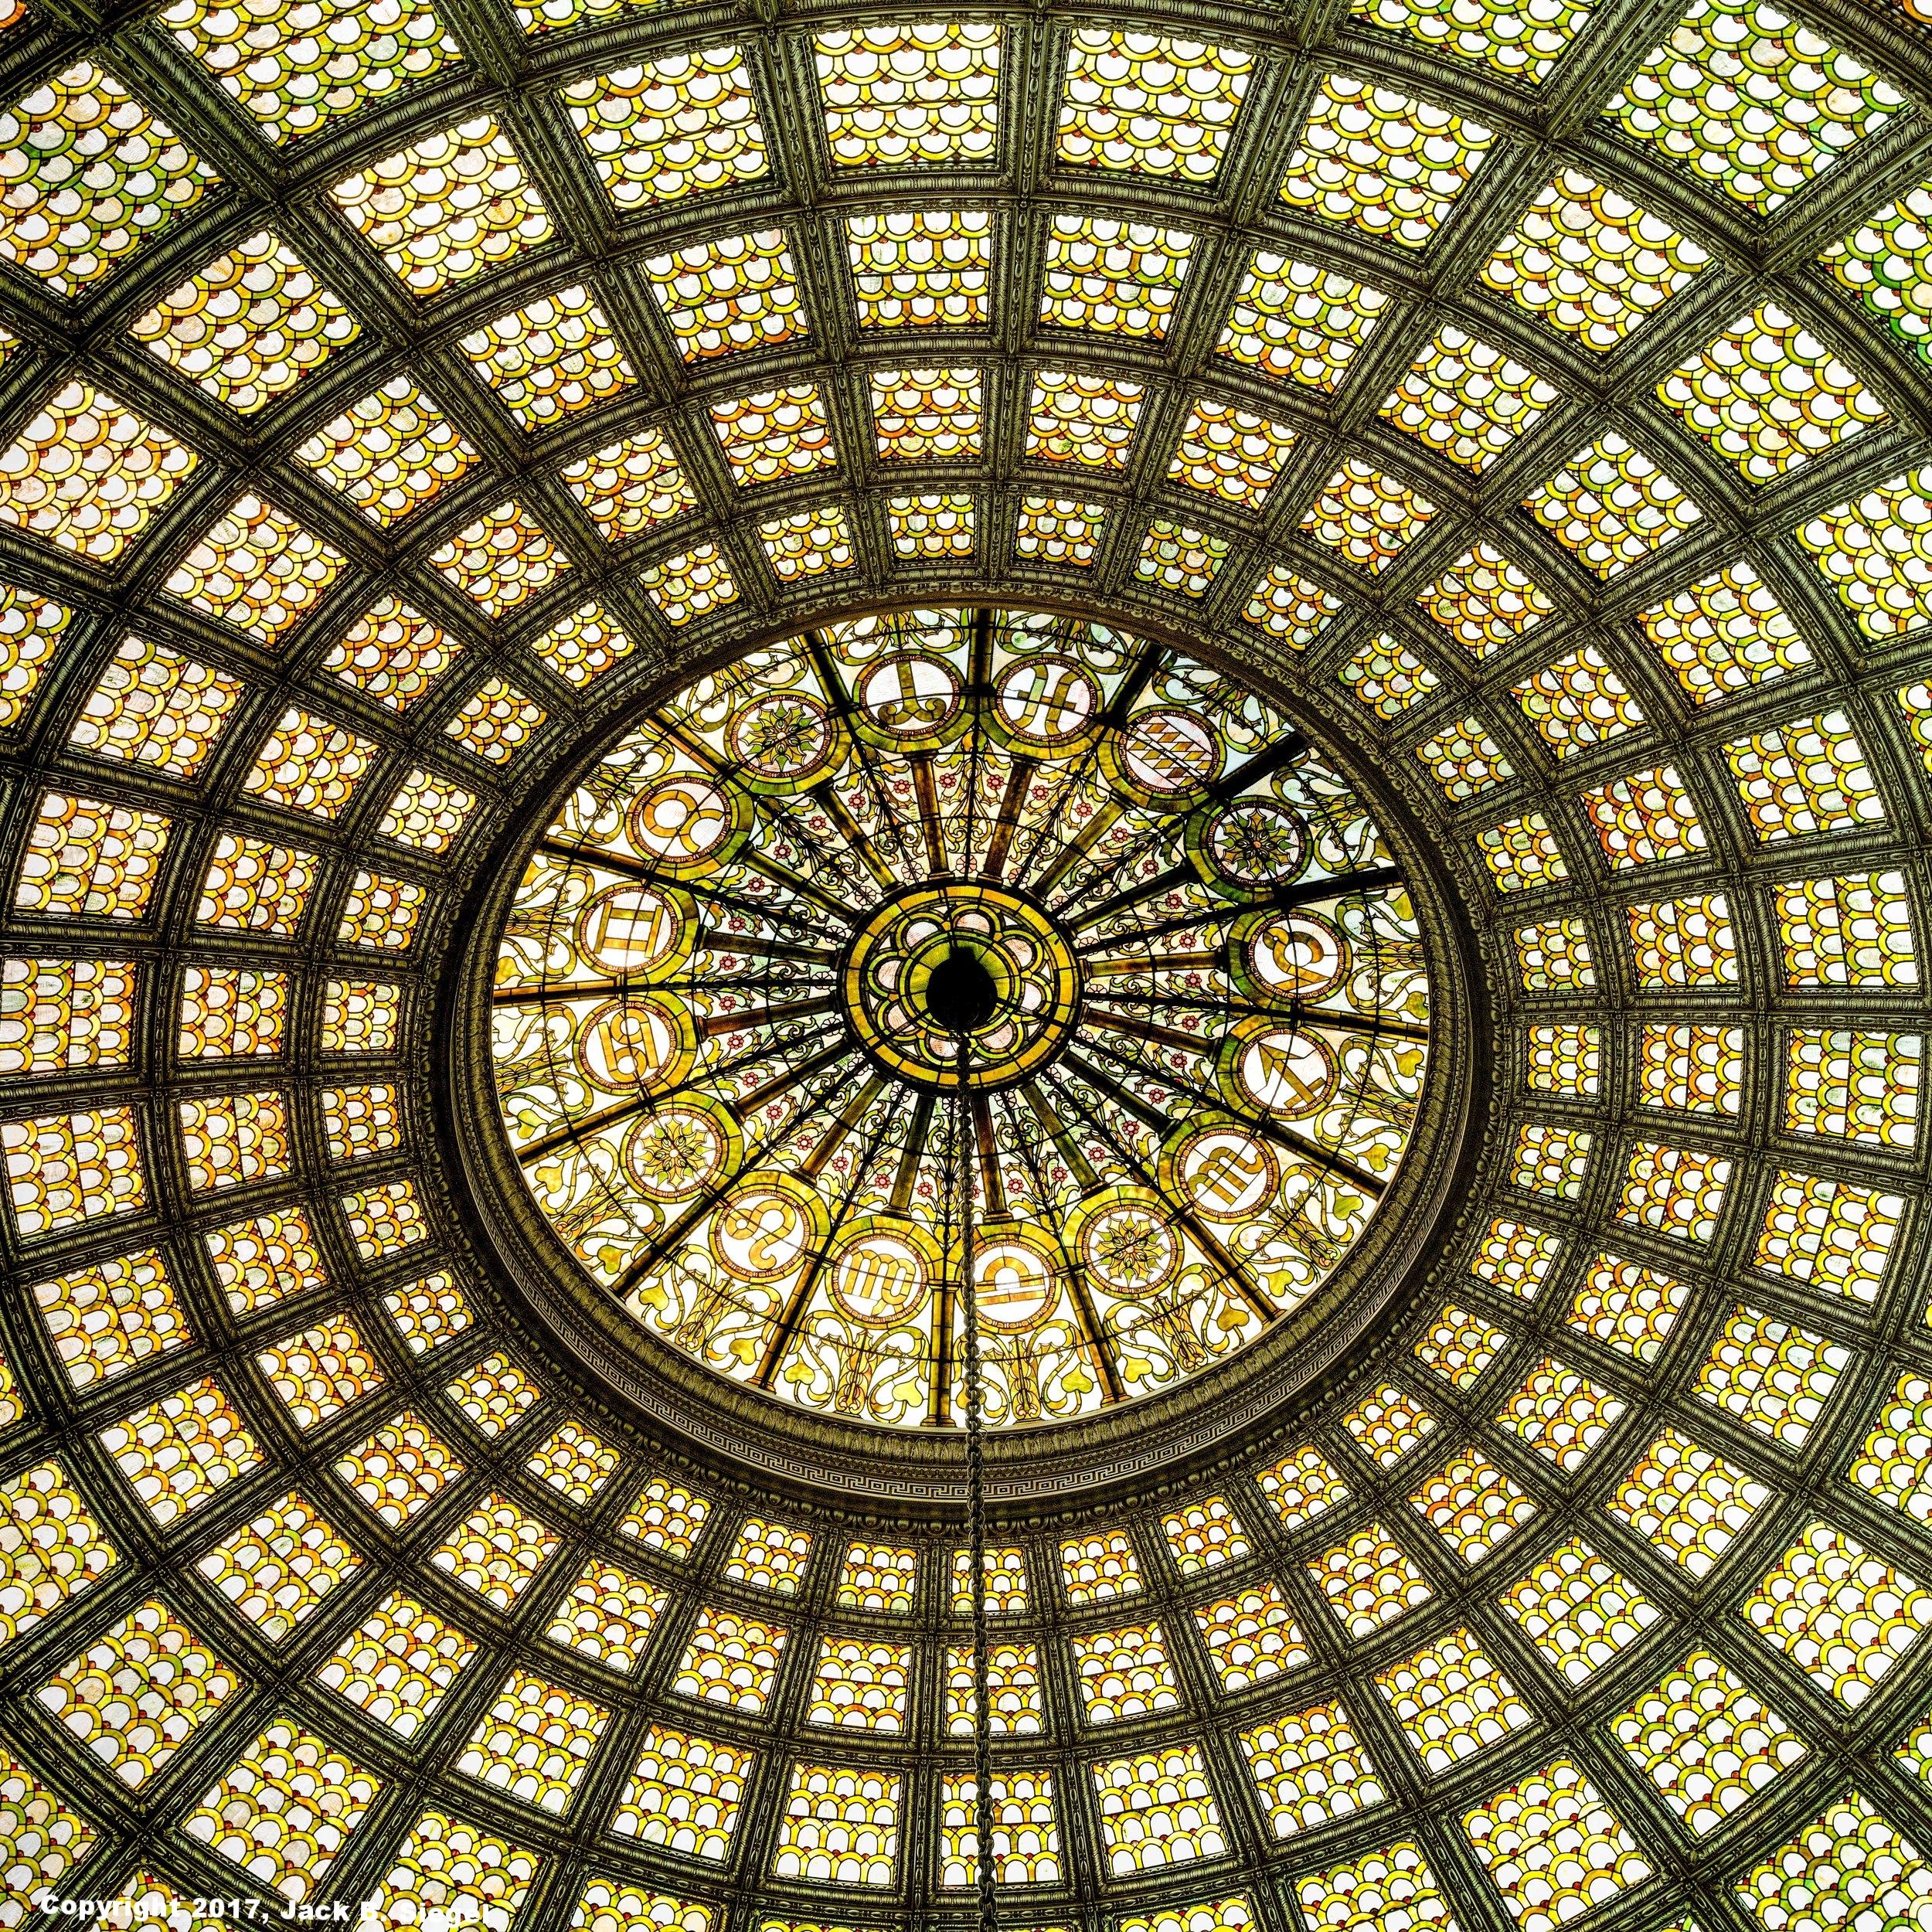 _DSF3240_Copyright_Square_sRGB_12_Relative_Tiffany Dome.jpg